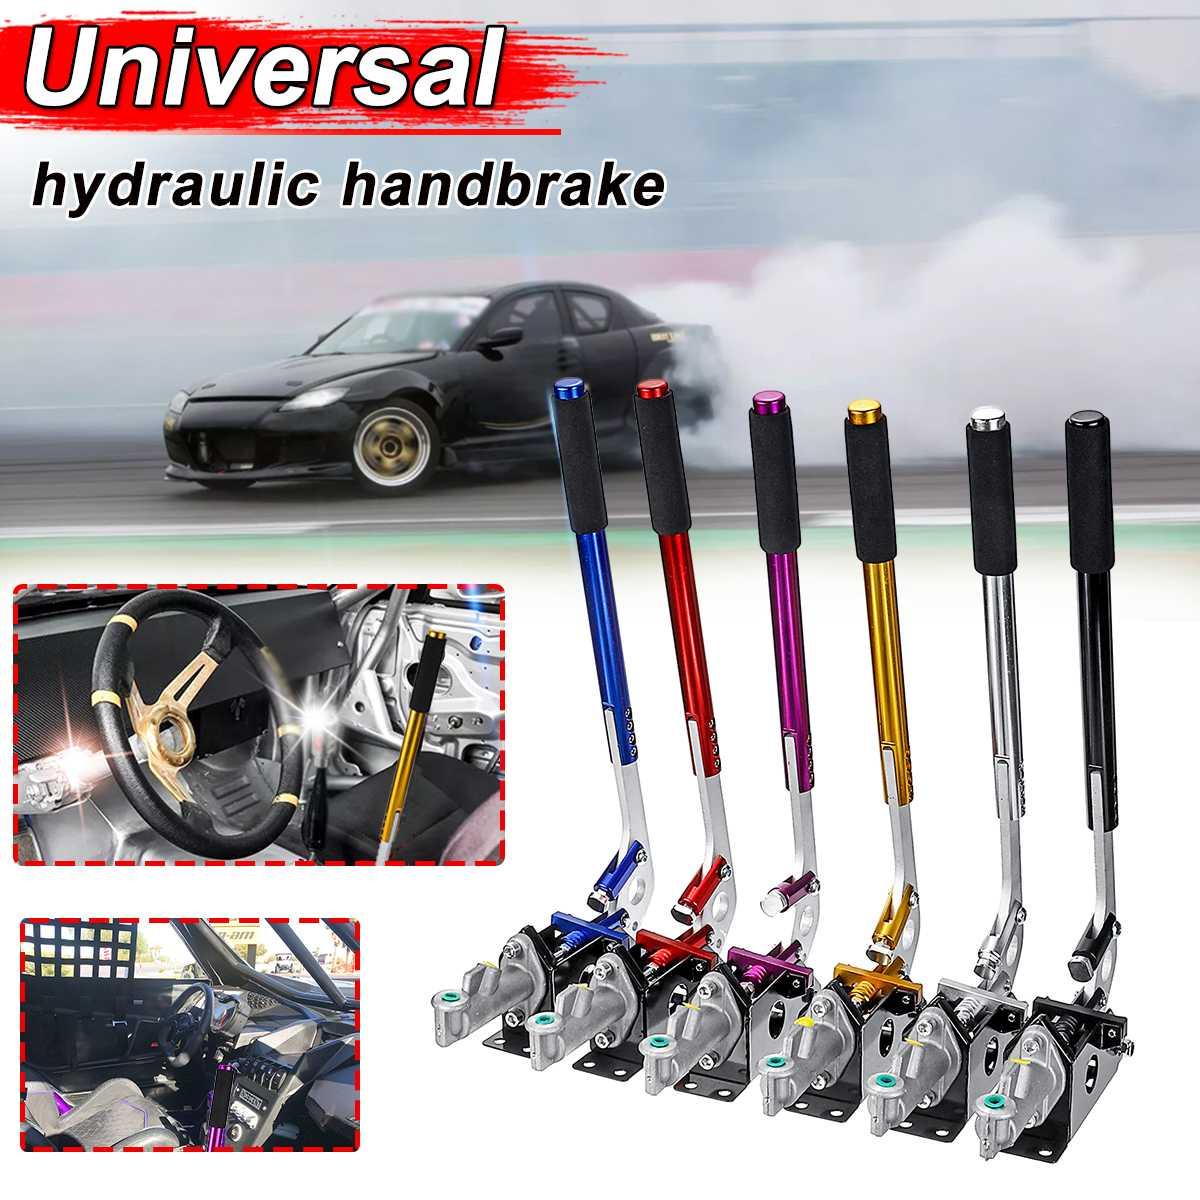 32,4 cm Aluminium Legierung Hydraulische Drift E Bremse M8 / M13 Racing Parkplatz Handbremse Hebel Getriebe Universal Hand Brems